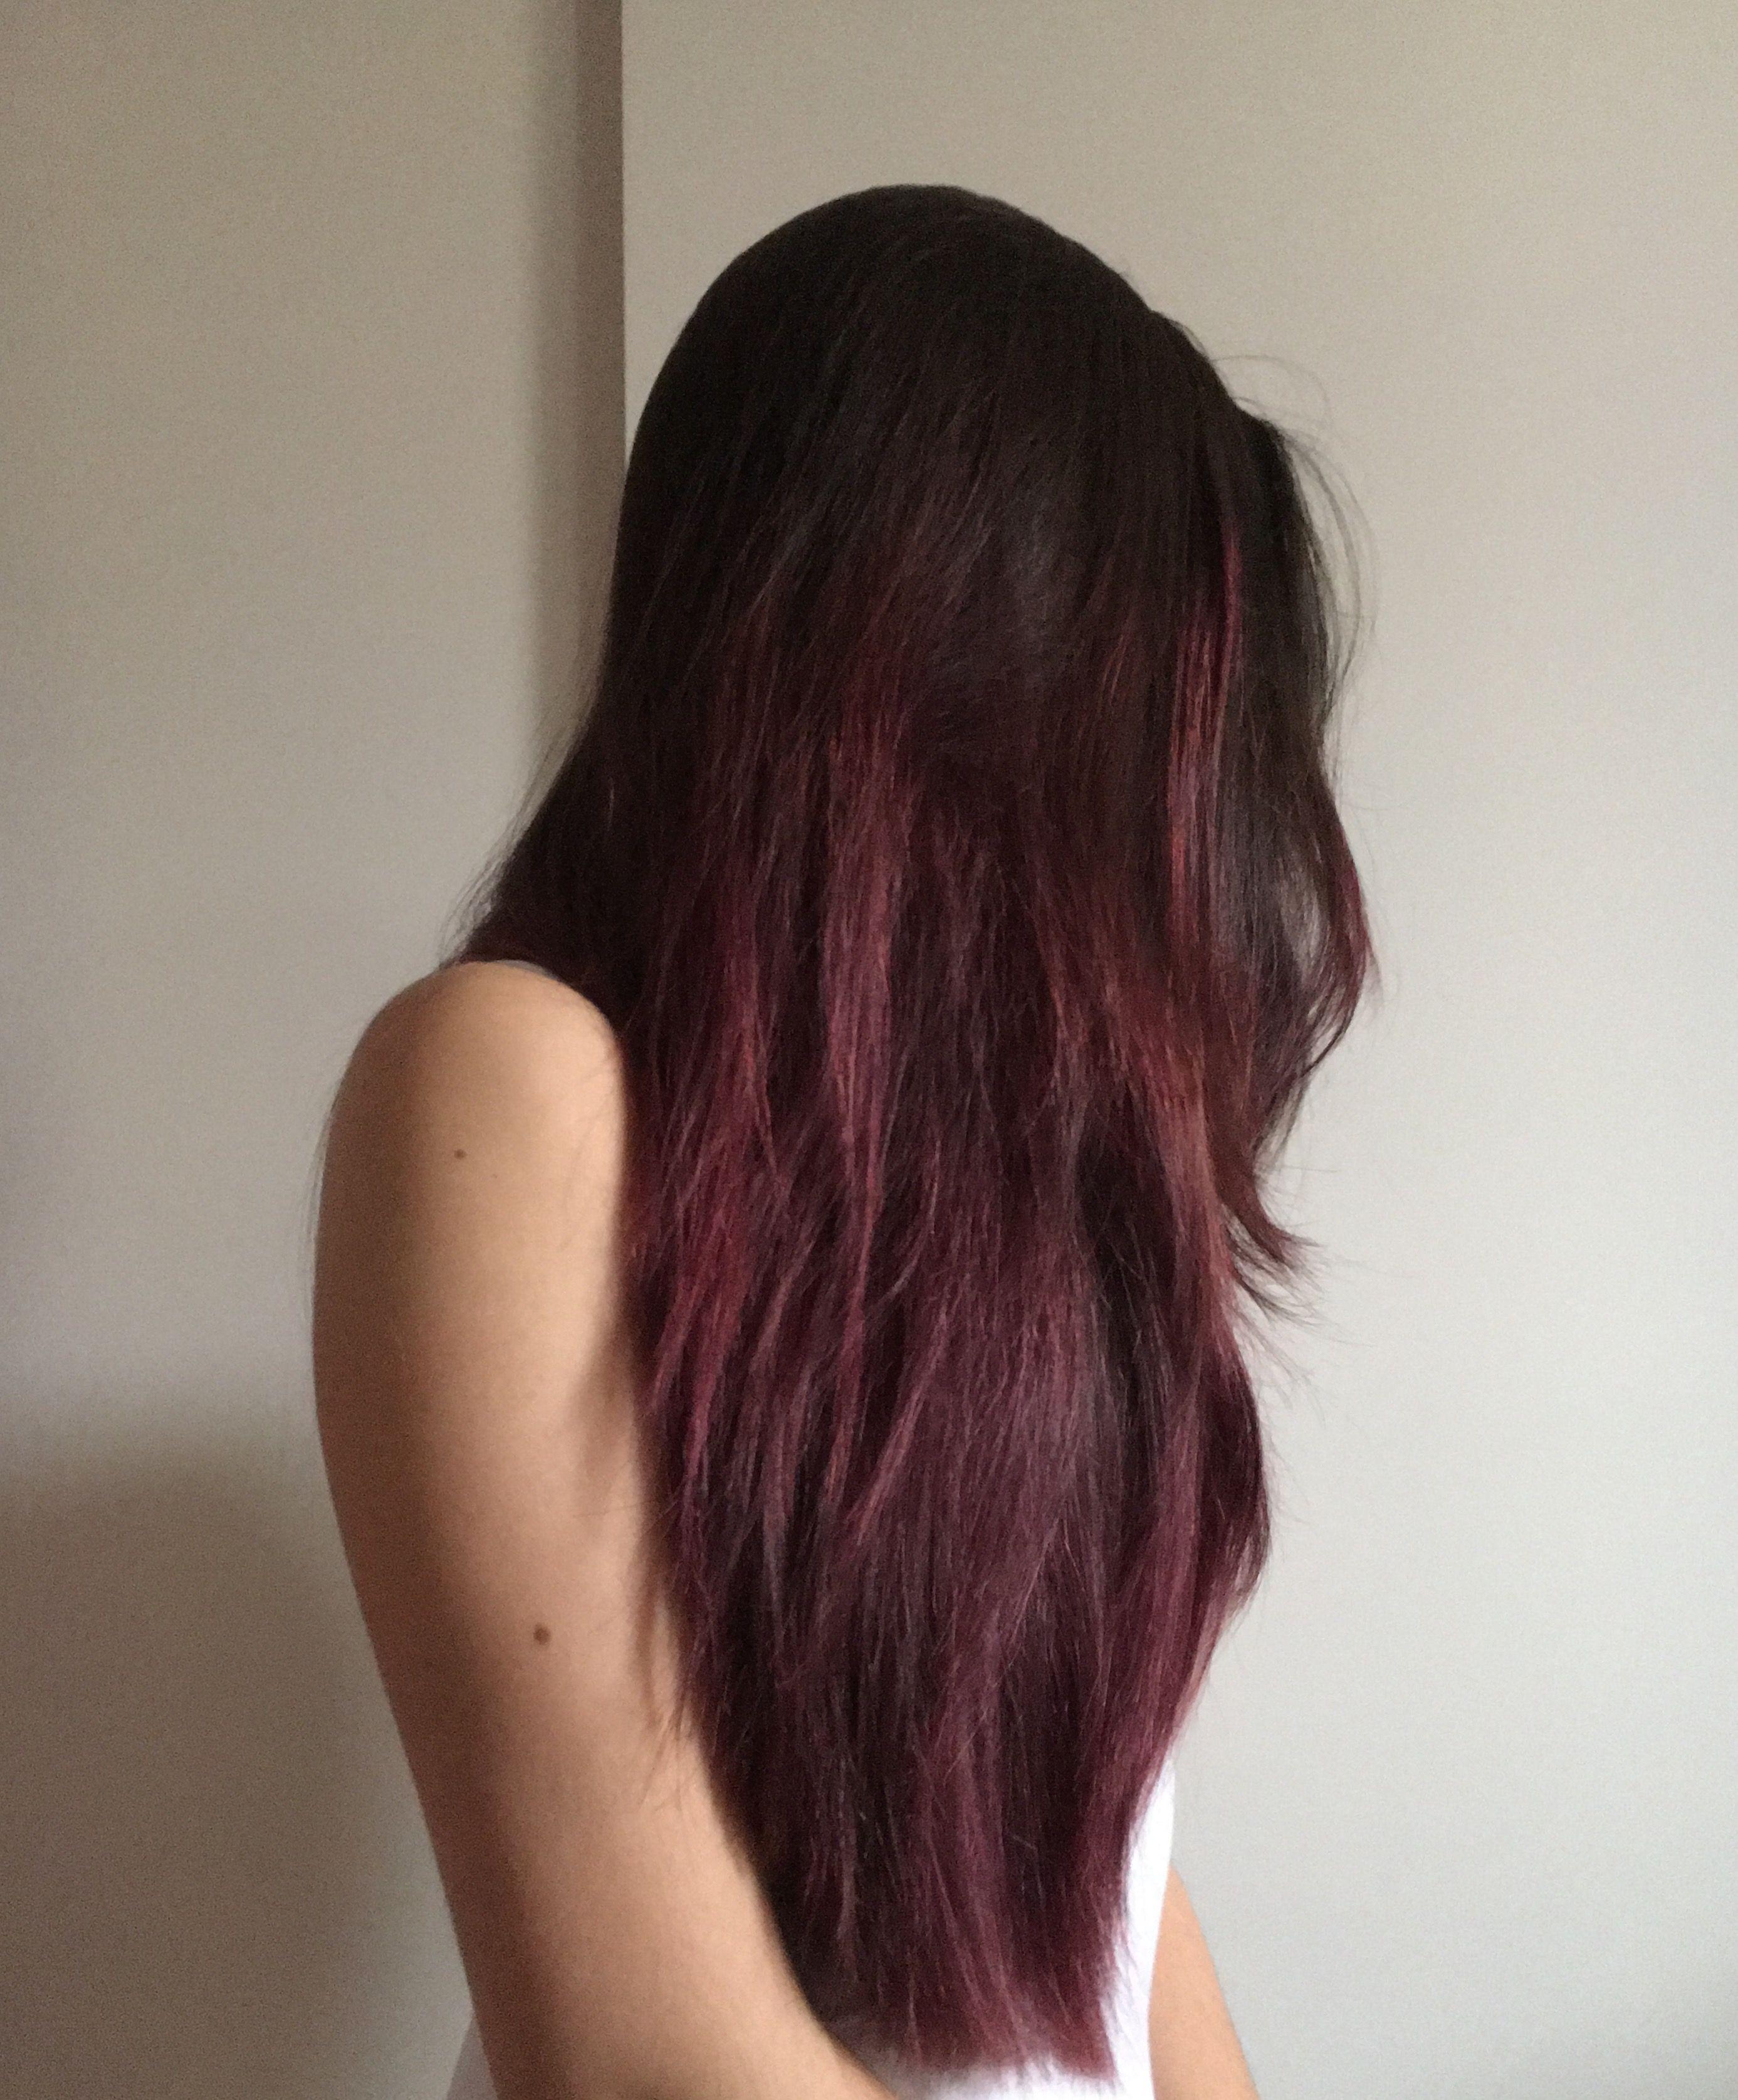 Loreal Colorista Washout Hair Newcolour Colorista Hair Dye